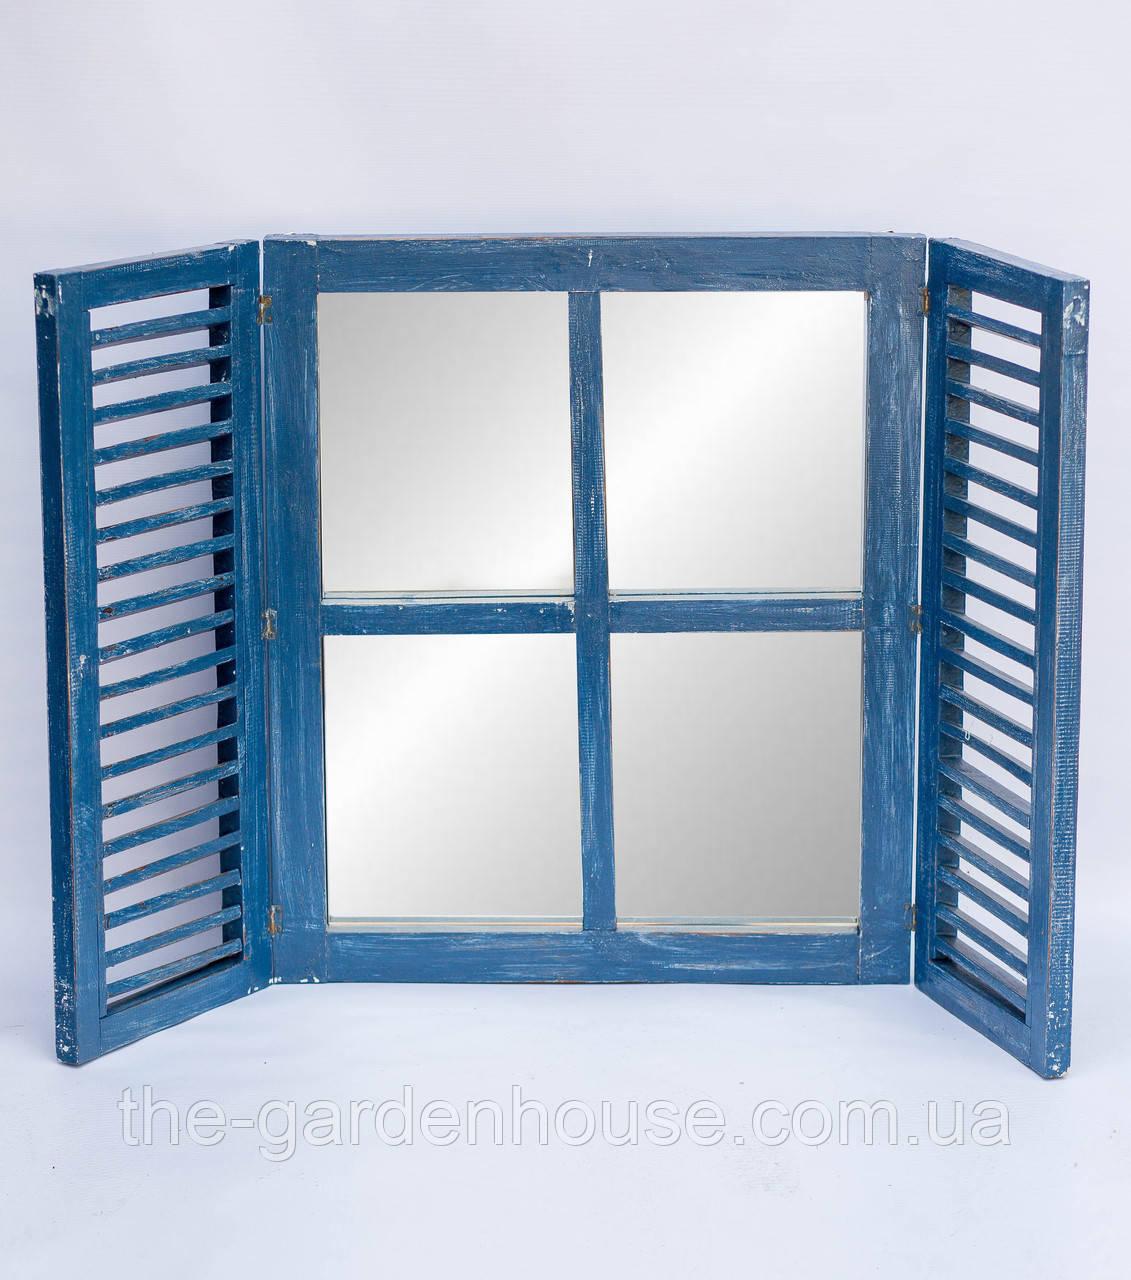 Зеркало со ставнями 60х70 см, синее